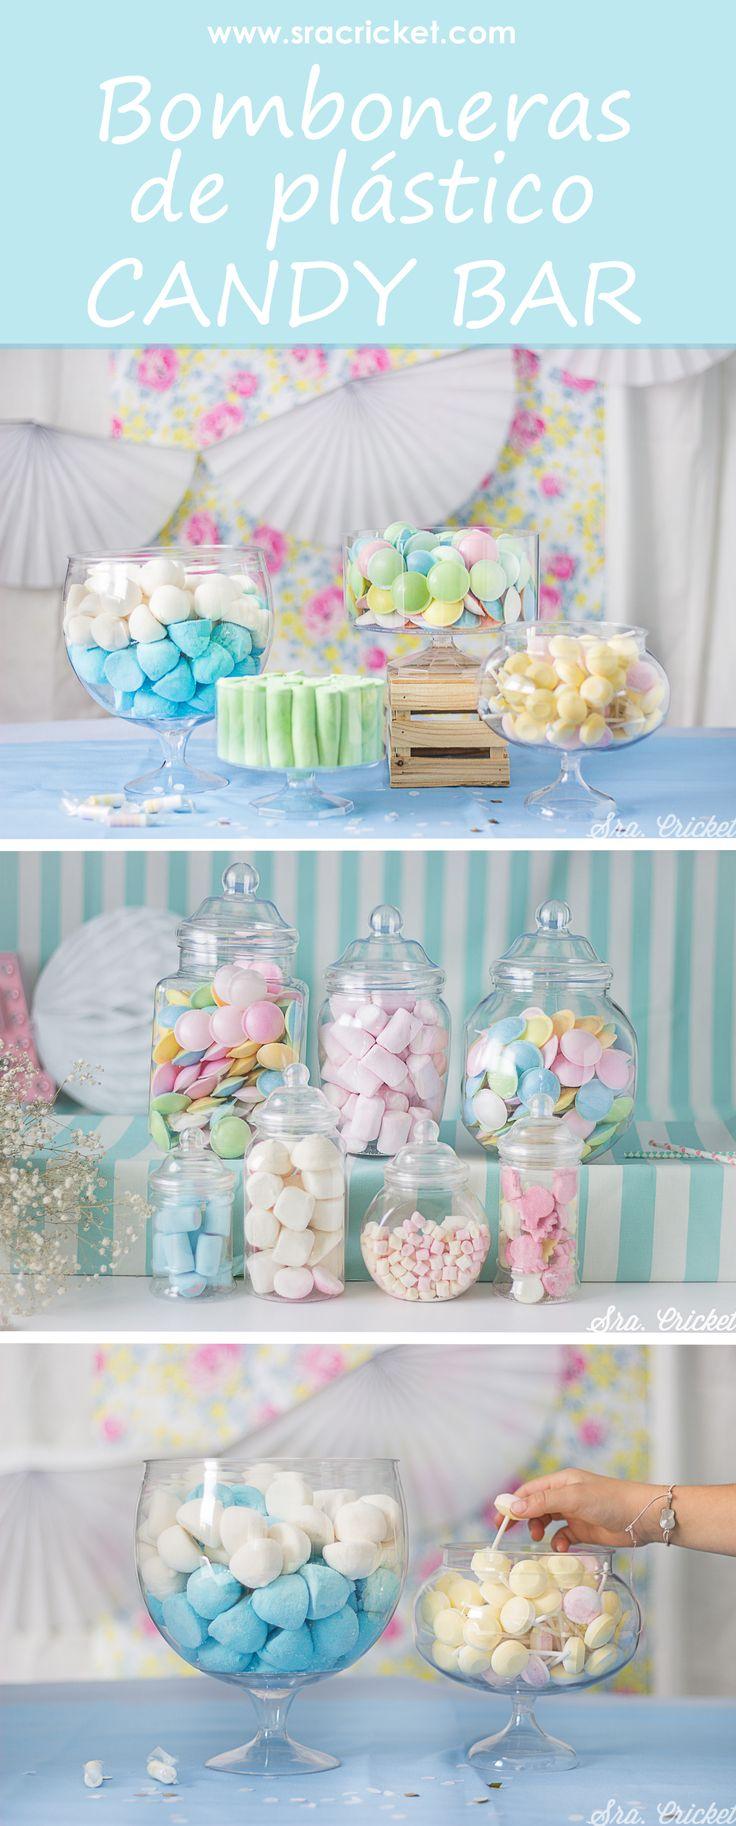 Boles, bomboneras y cuencos de plástico para candy bar - Doğum günü , Candy Bar Party, Candy Table, Candy Buffet, Dessert Table, Birthday Party Decorations, Birthday Parties, Pastell Party, Candy Bowl, Wedding Catering